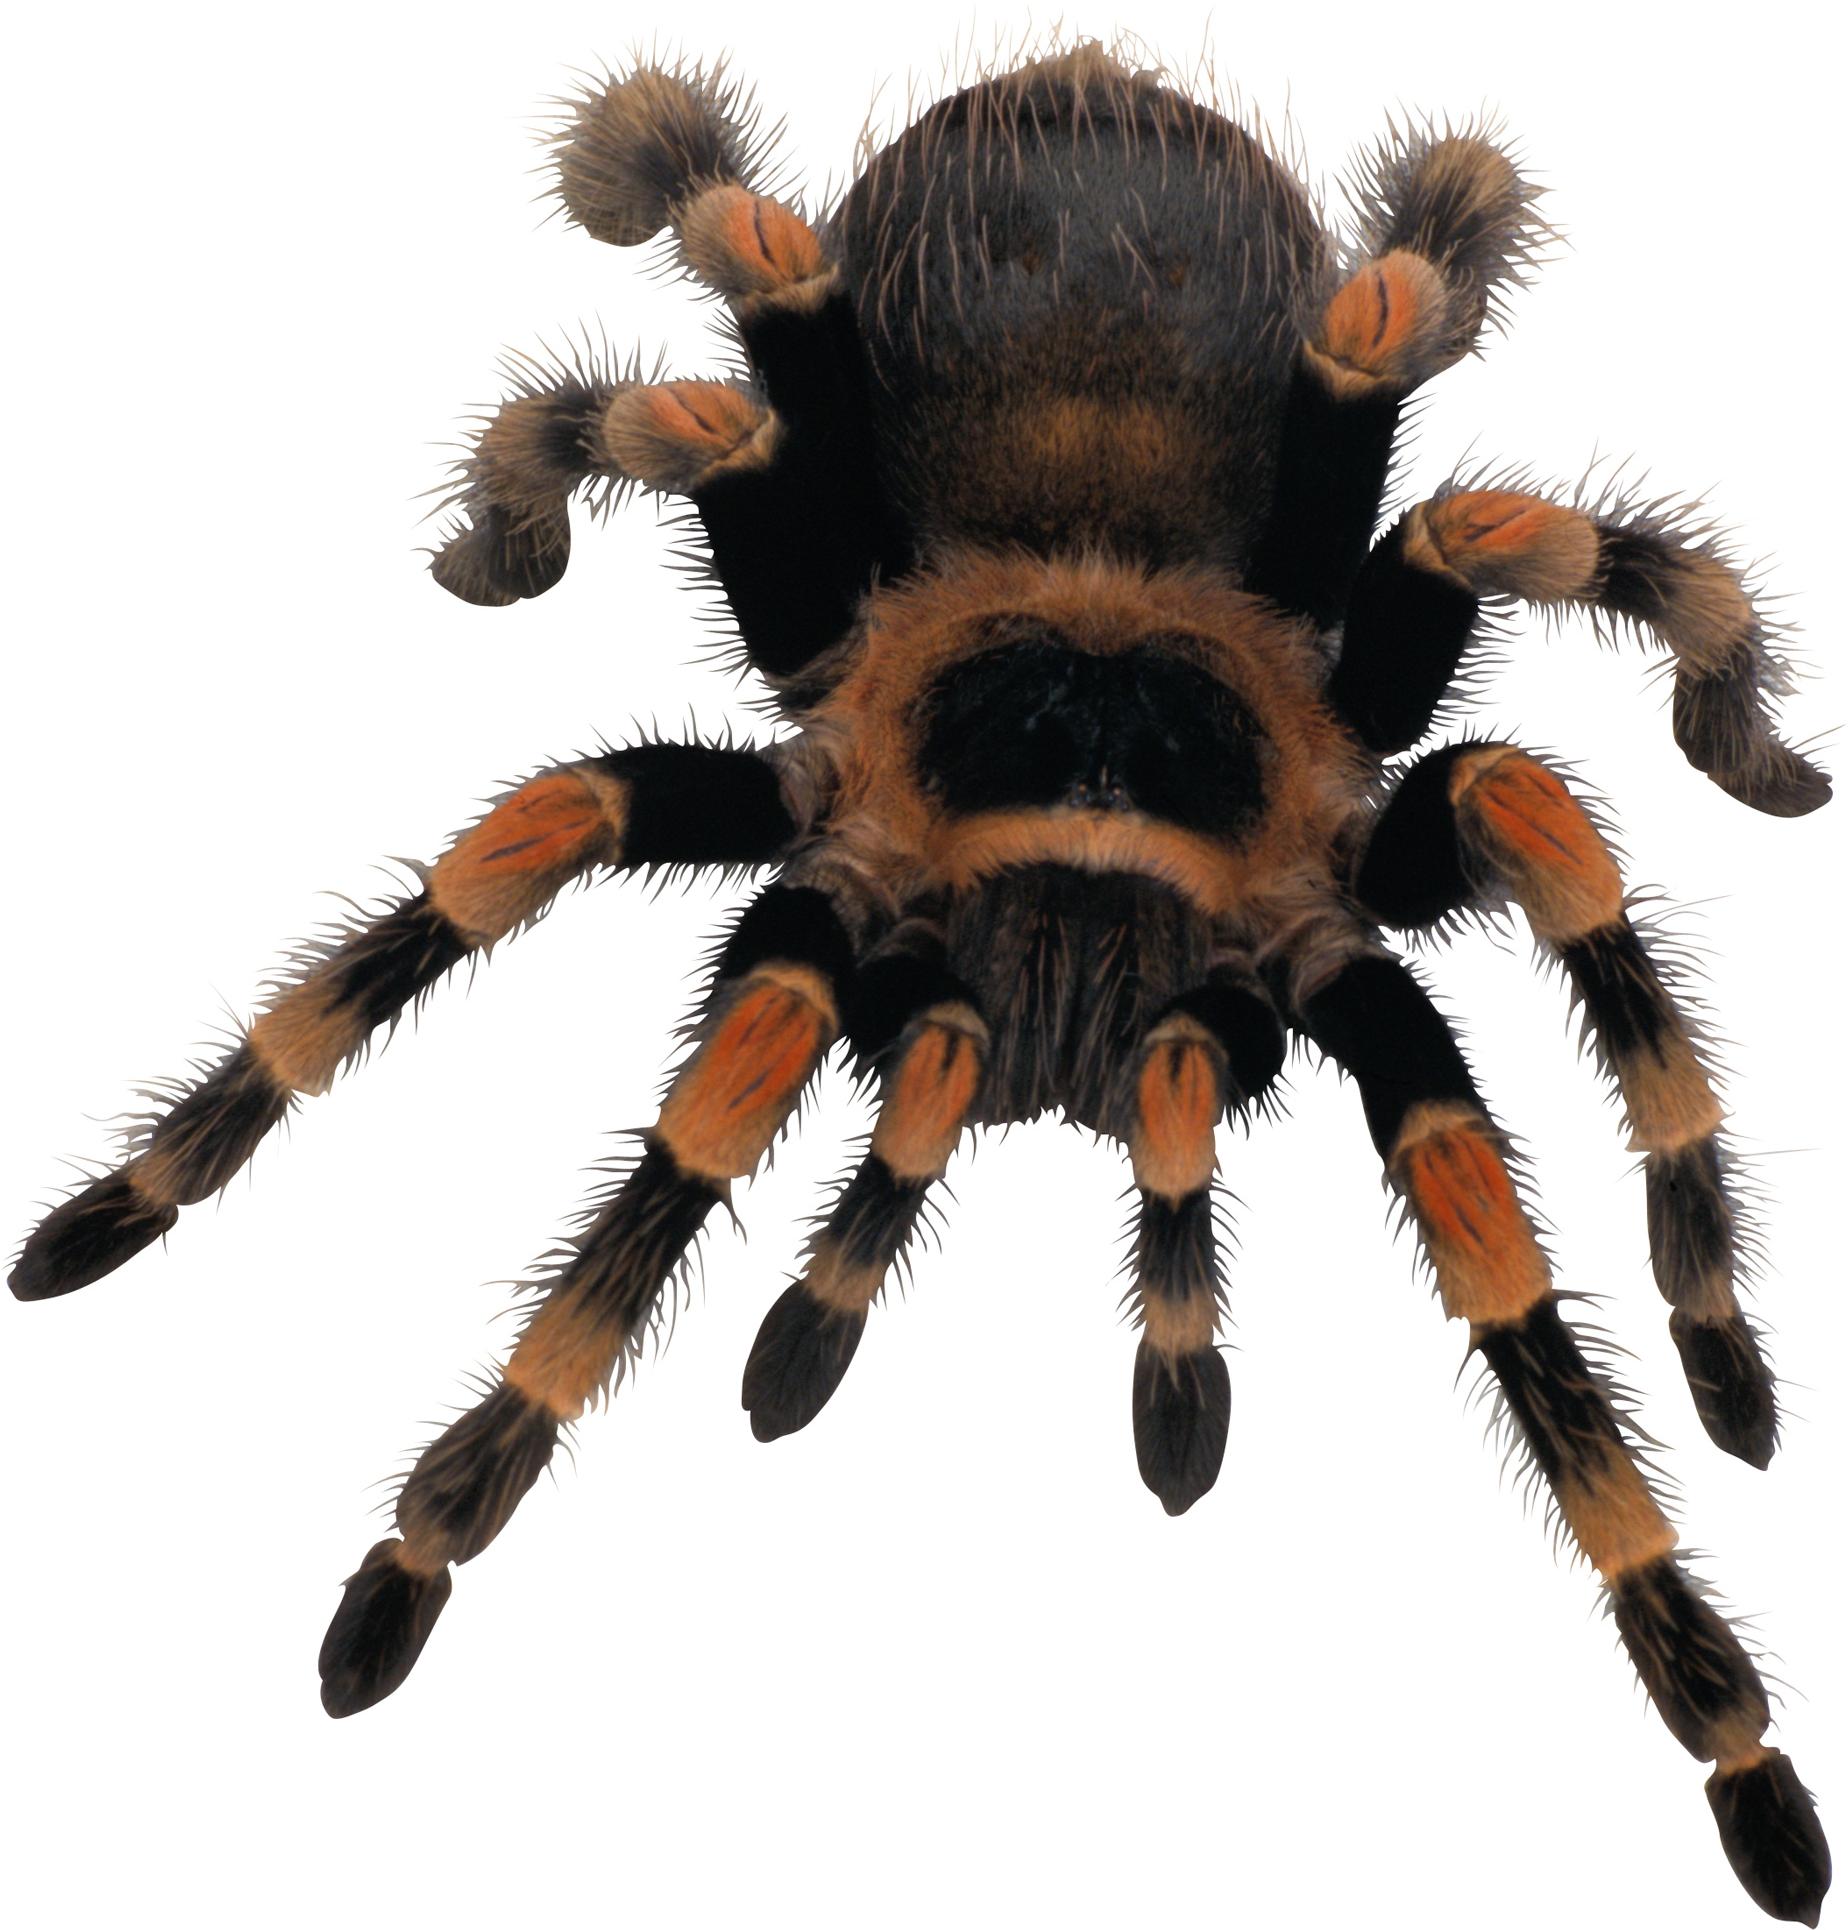 Spider transparent background